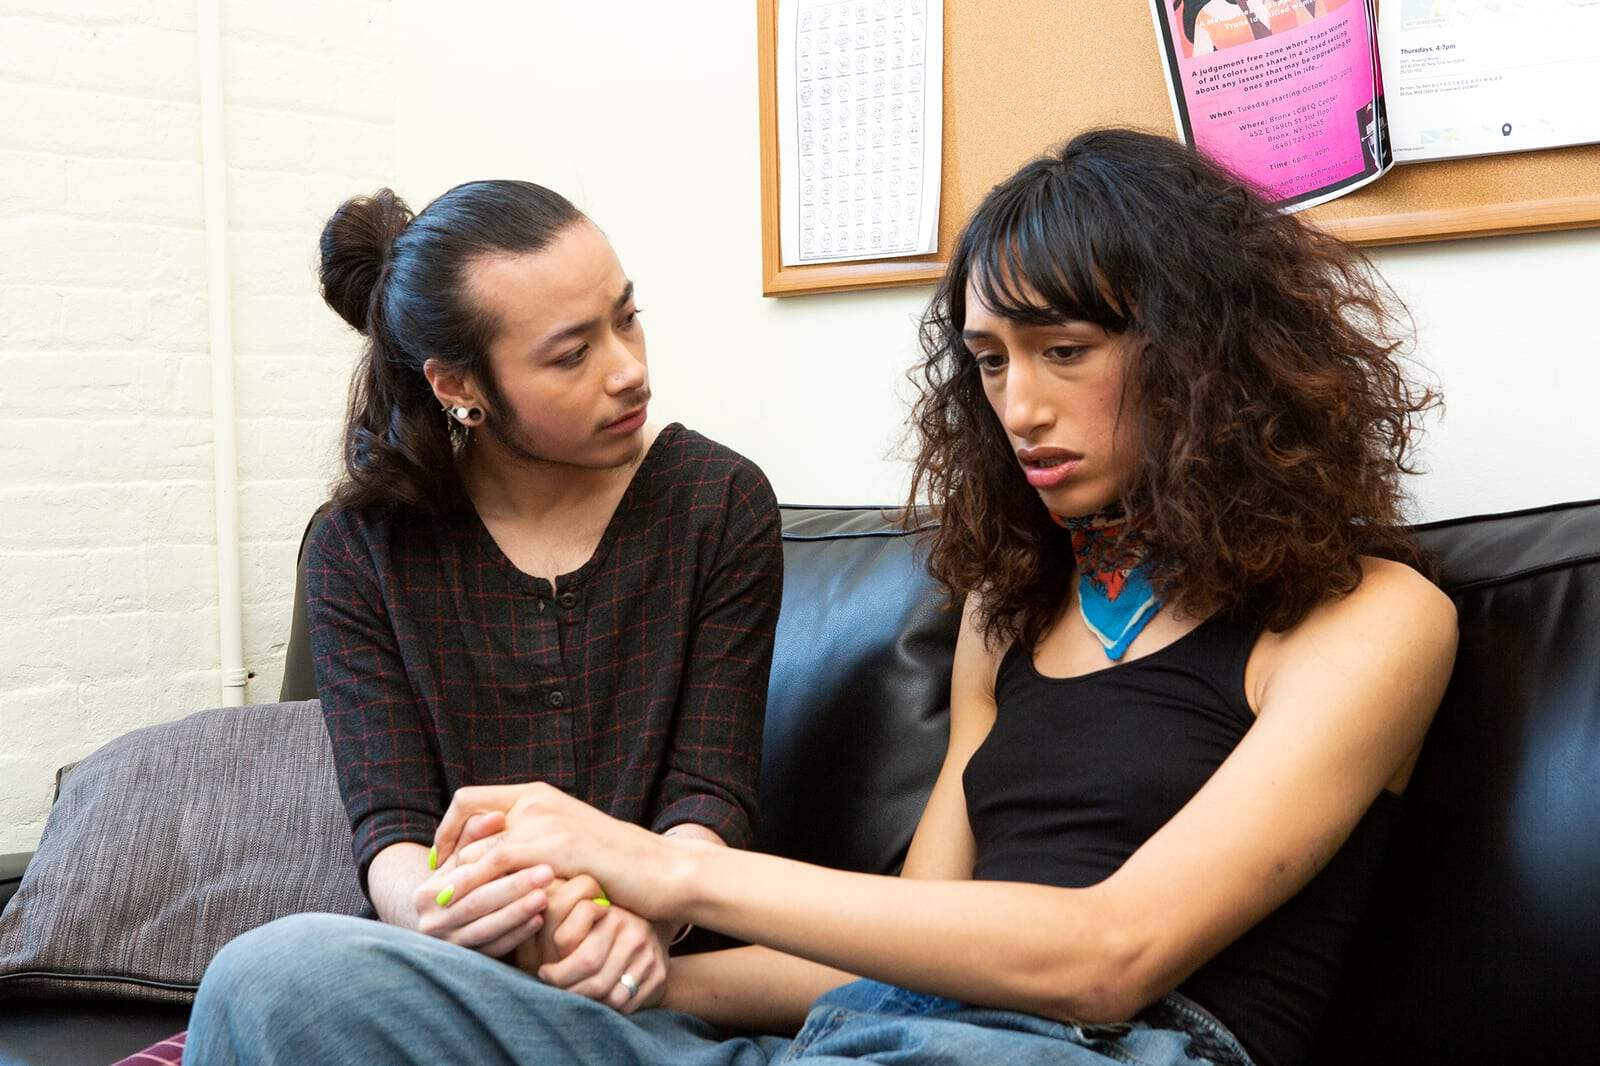 terapia afirmatywna psycholog lgbt psycholog warszawa seksuolog dominik haak